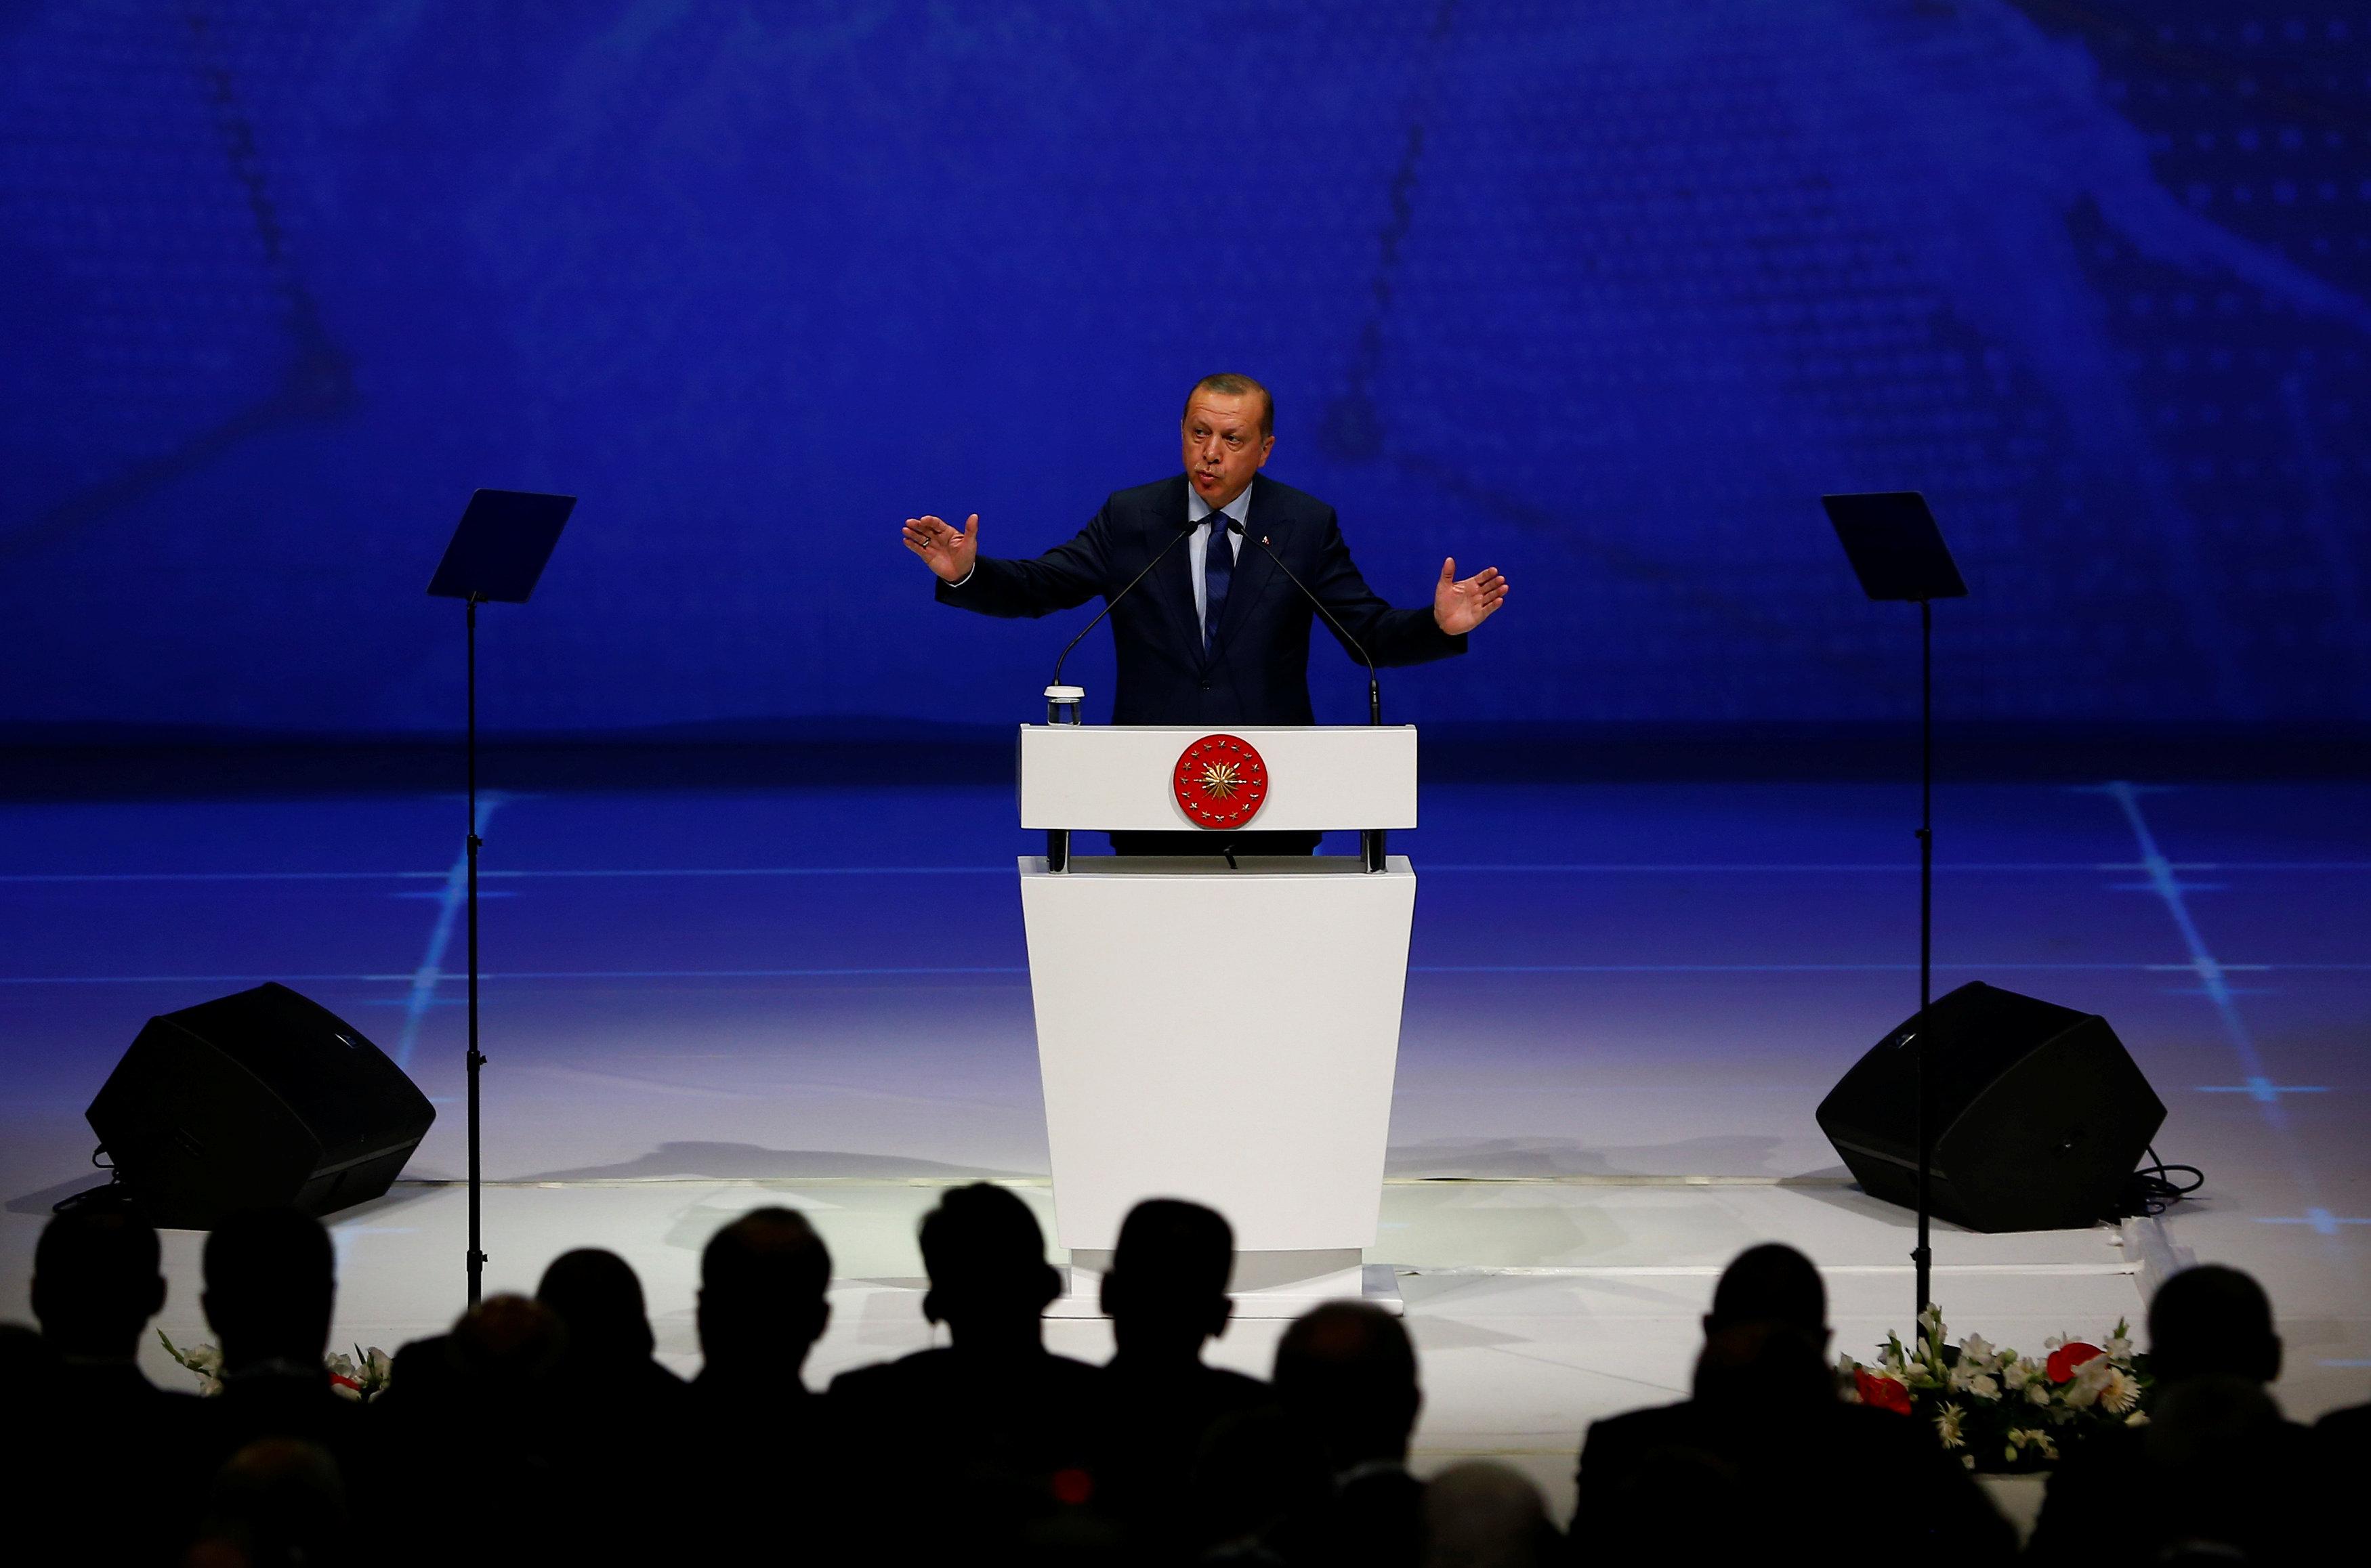 Turkish President Tayyip Erdogan makes a speech at the 22nd World Petroleum Congress in Istanbul, Turkey, July 10, 2017.